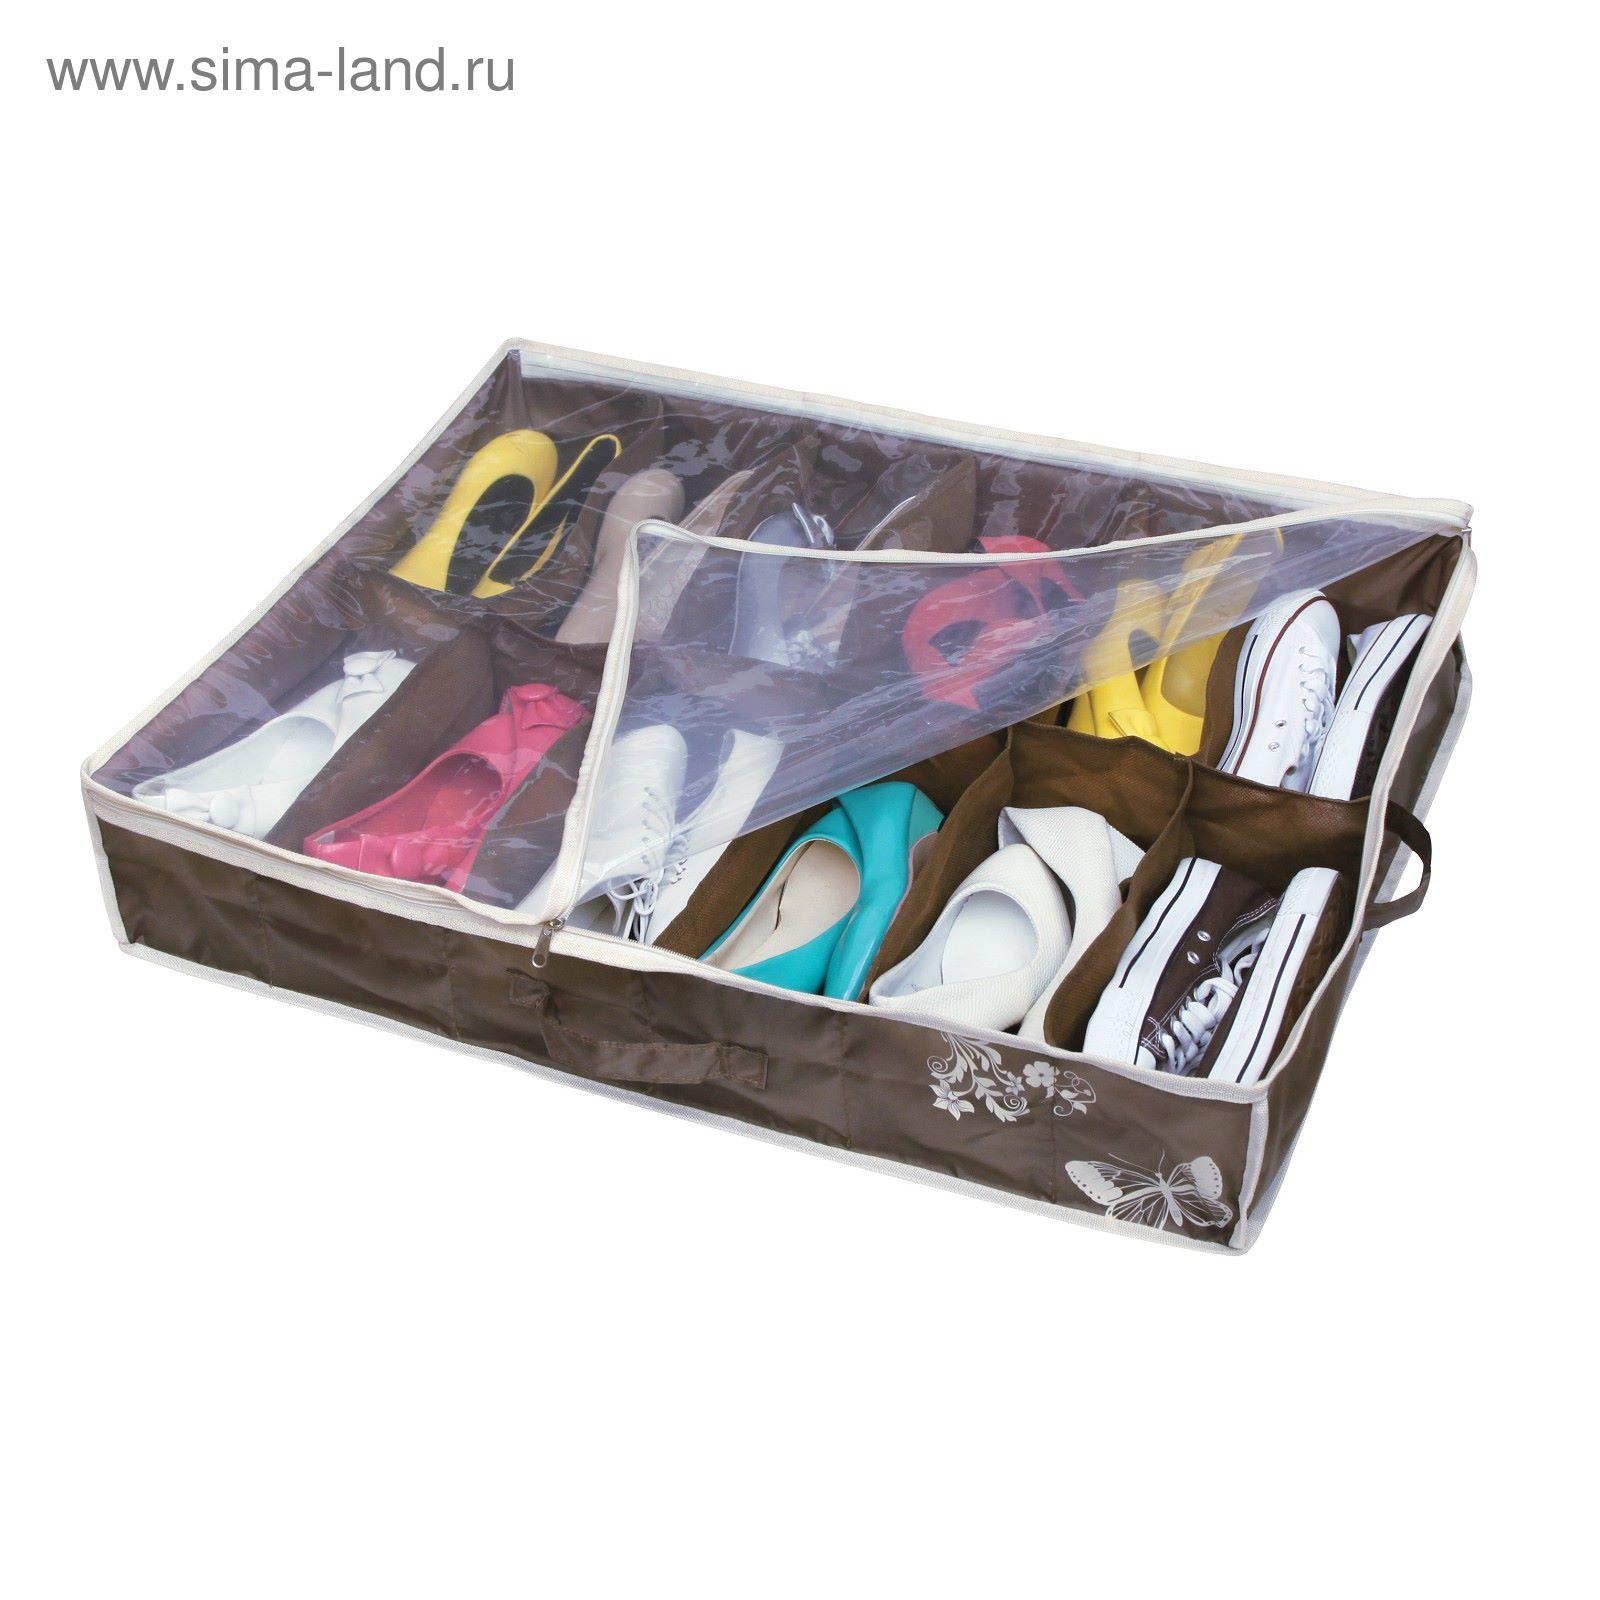 Чехол для хранения обуви HAUSMANN 0cce71debdfb3